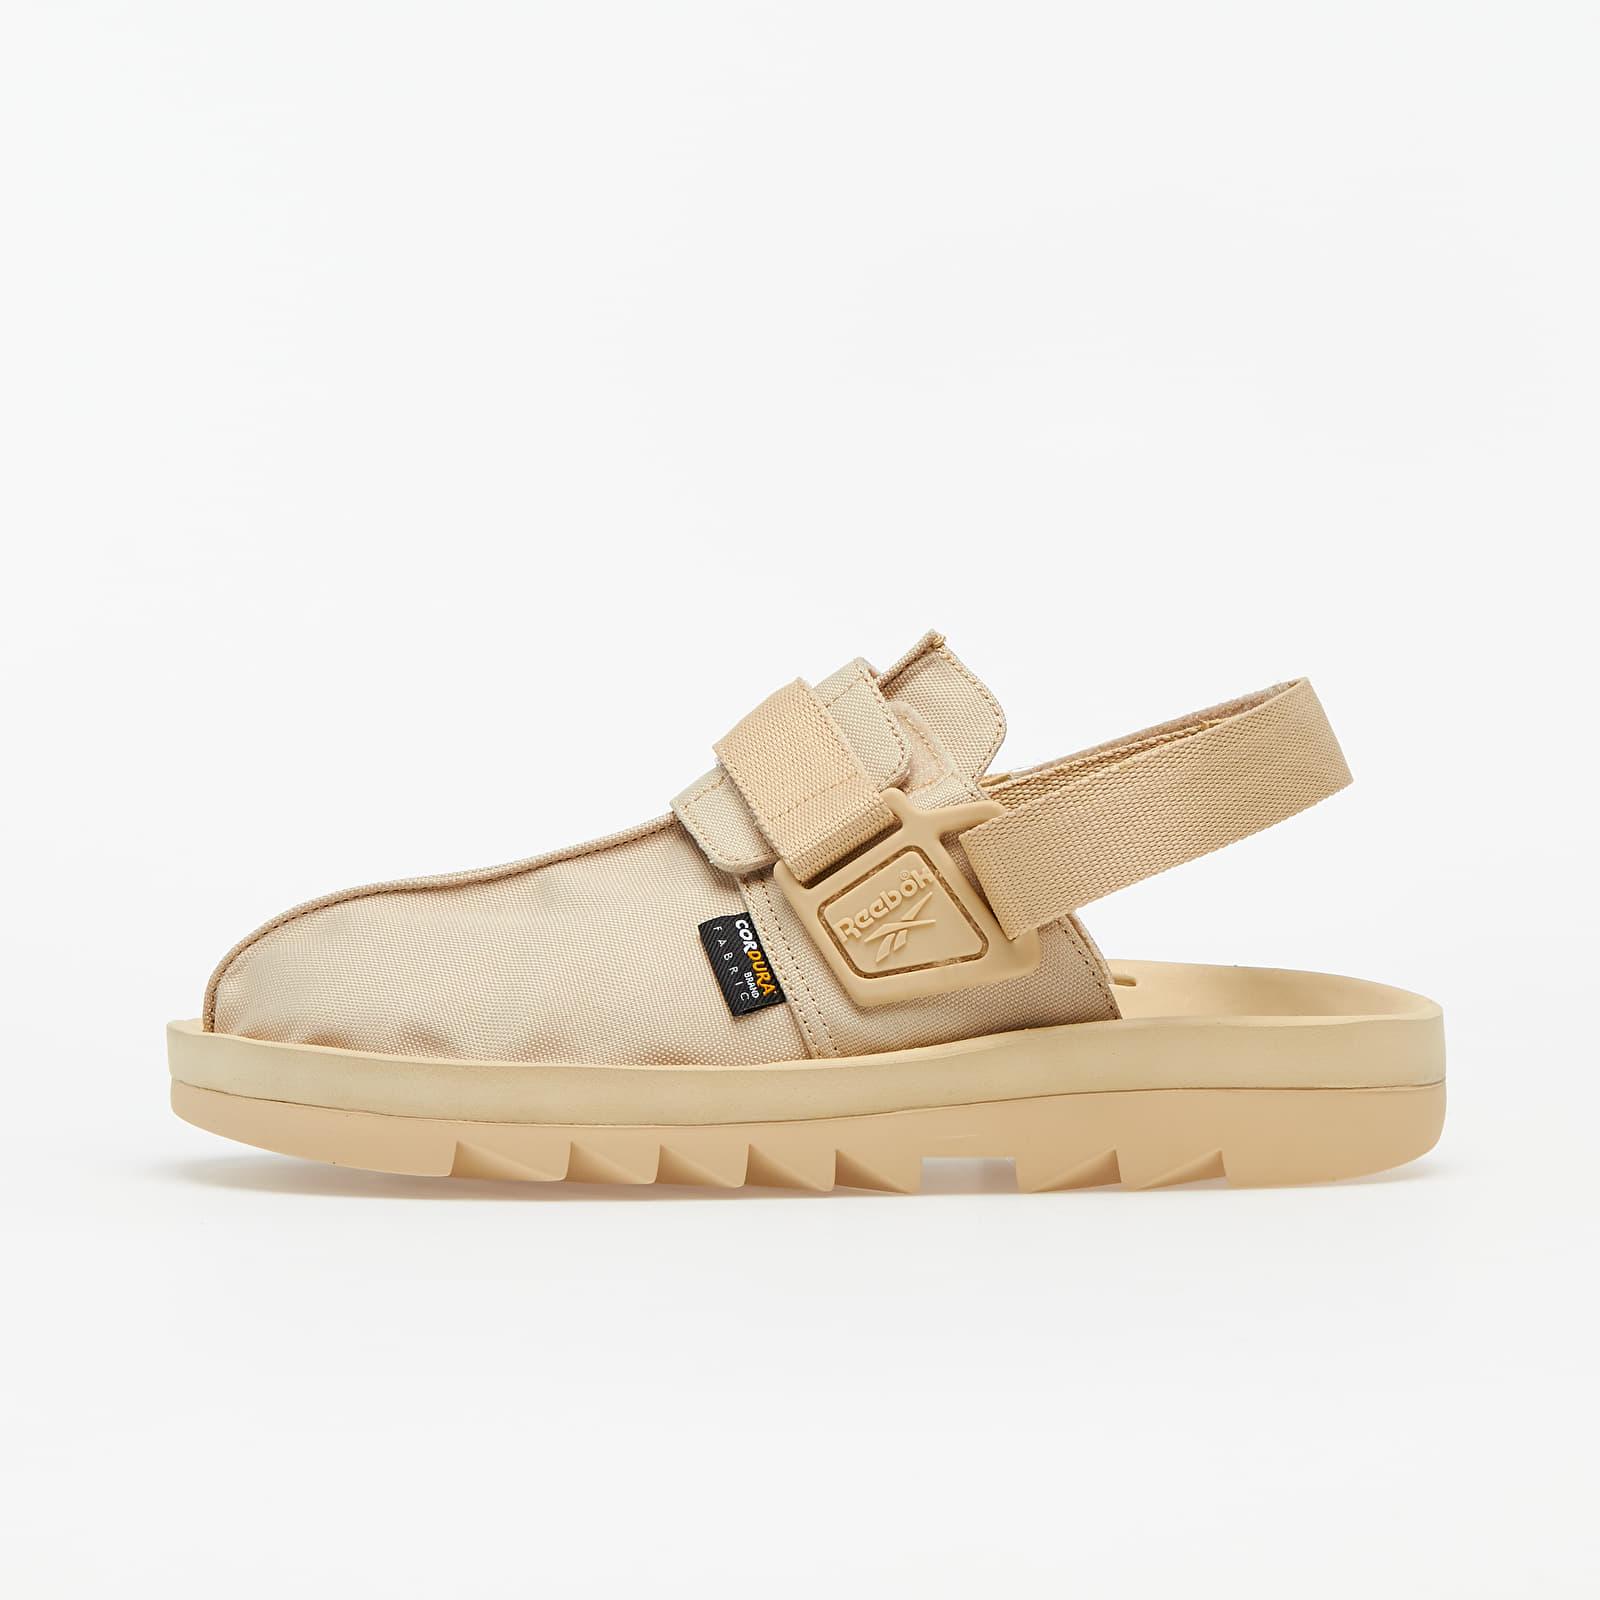 Men's shoes Reebok Beatnik Utility Beige/ Utility Beige/ Utility Beige